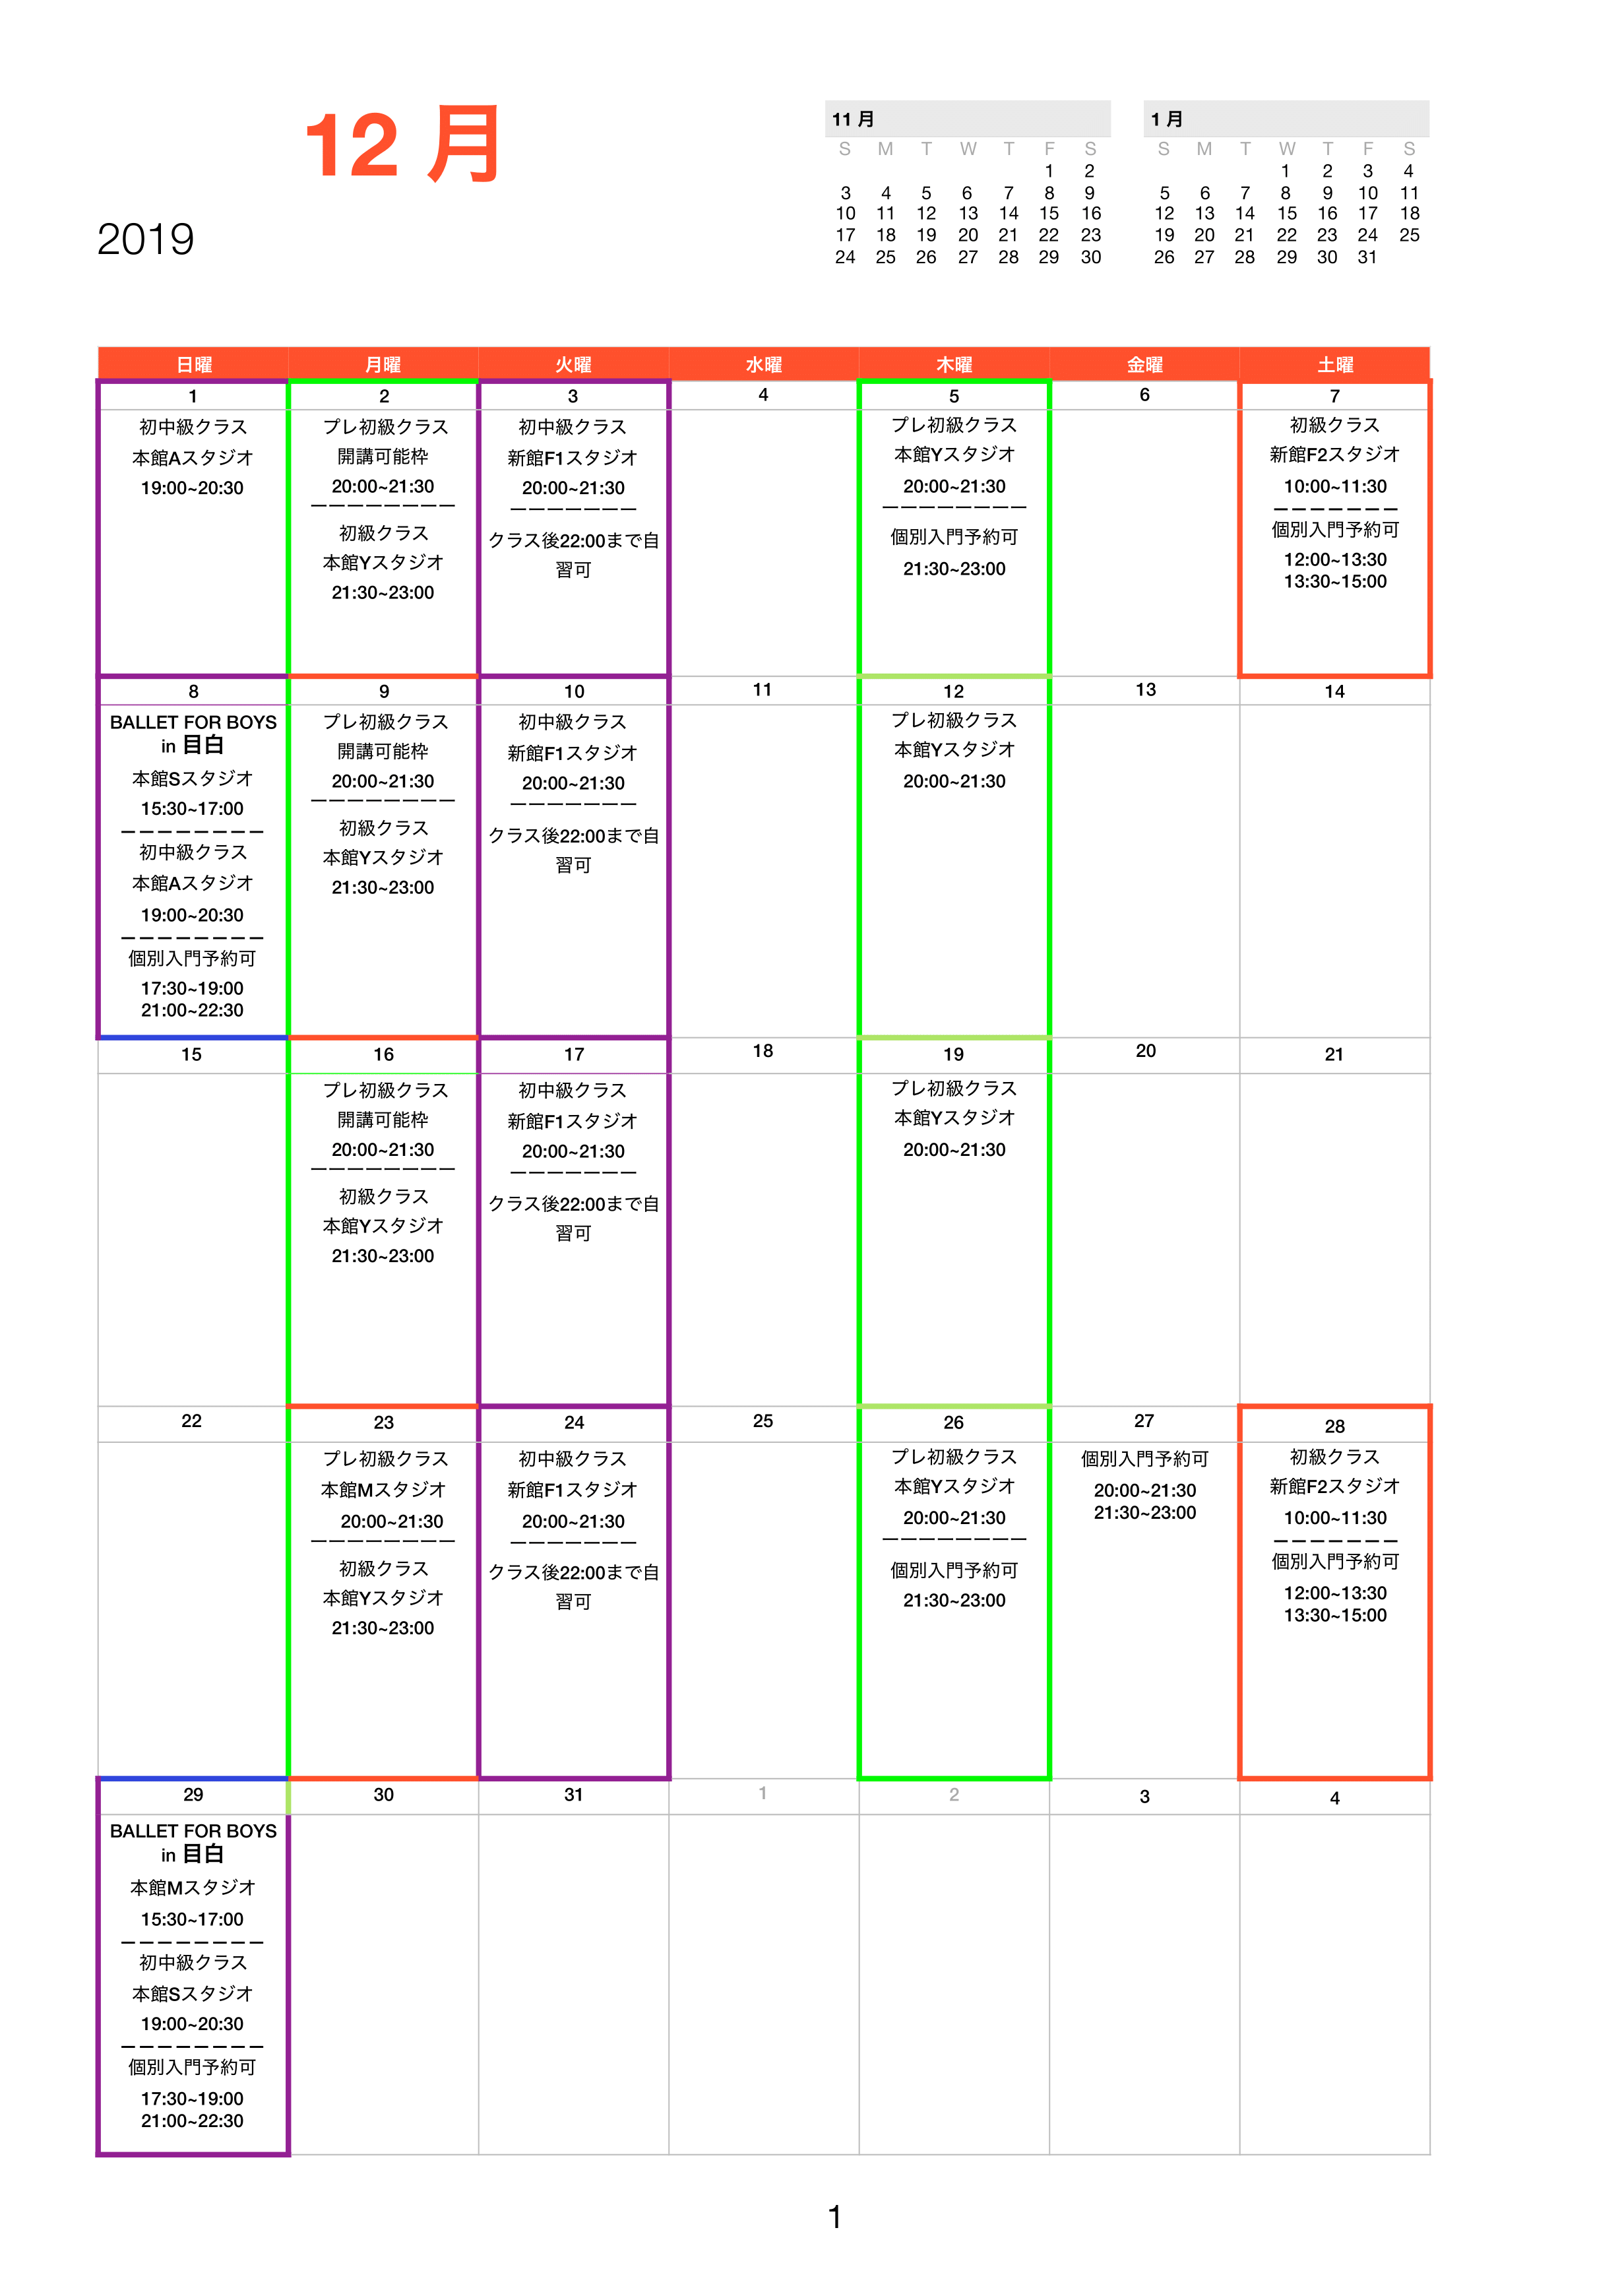 BFMsch2019:12:3-1